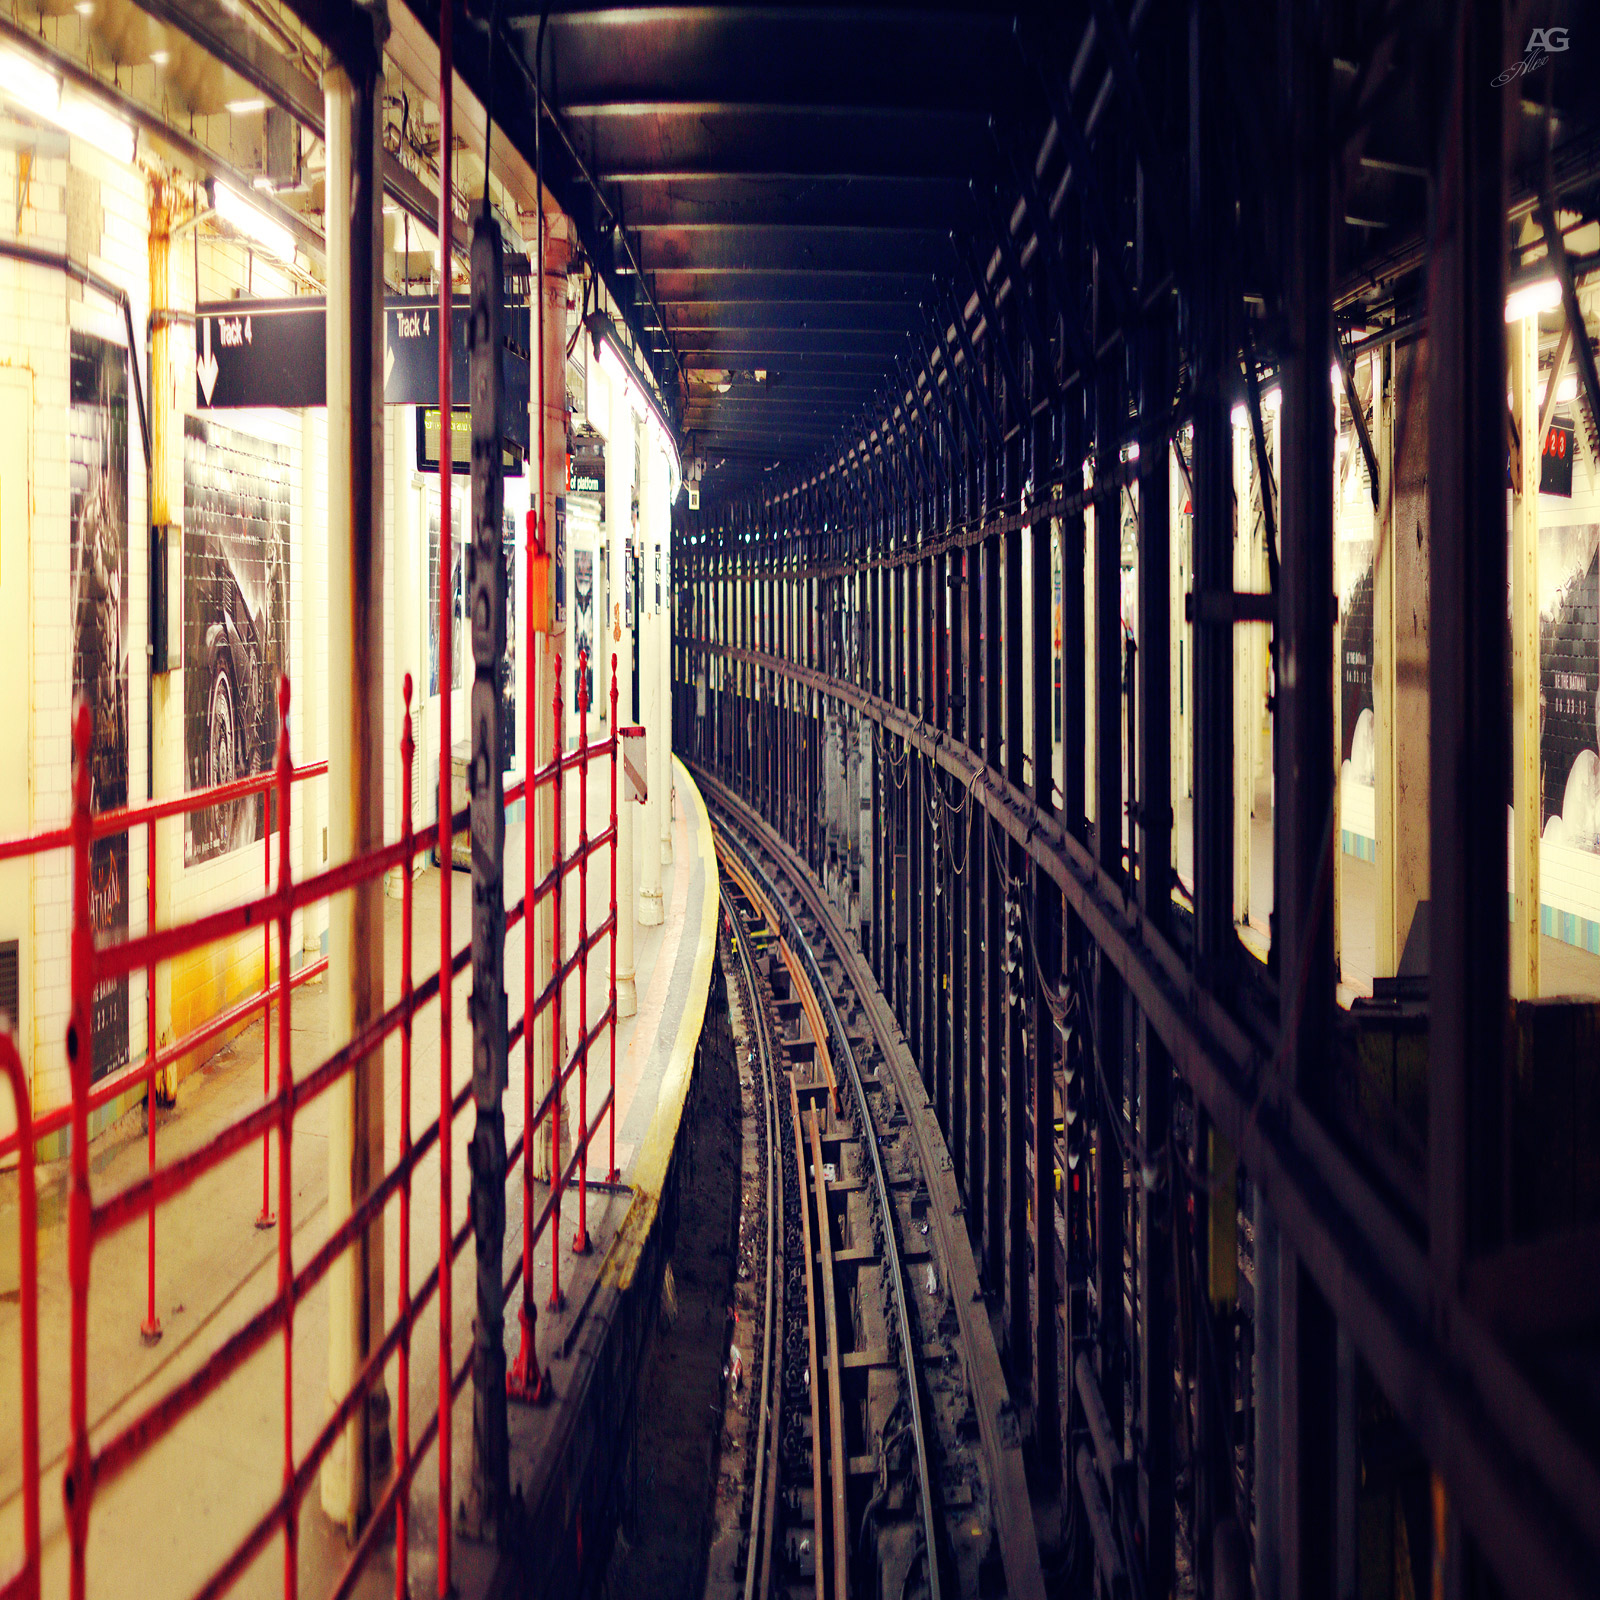 TrainSubwayTracksFromDeadFront42StreetStation_squished_1600